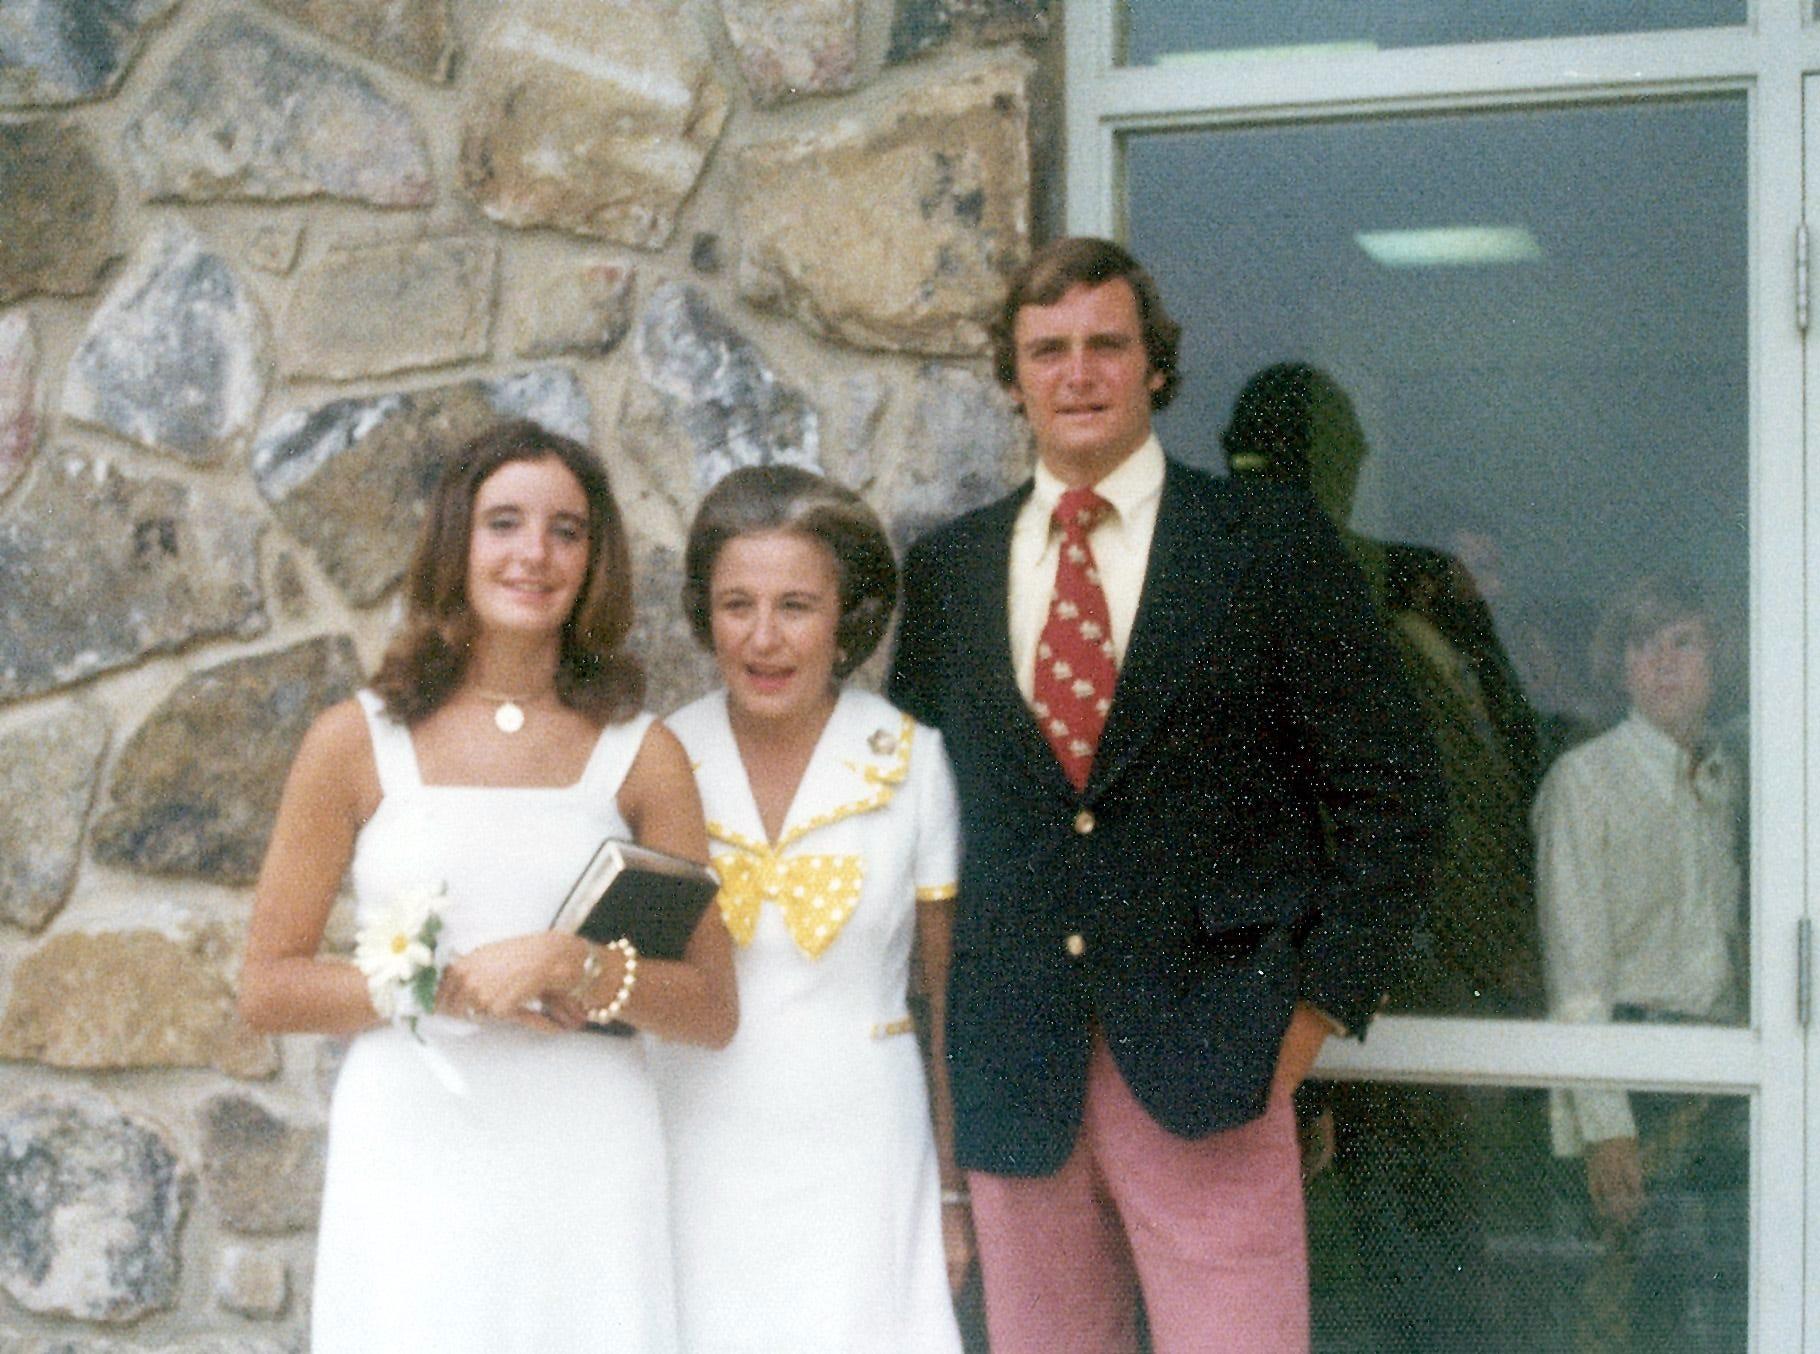 Ann, Cynthia, Jimmy Haslam June 1974.